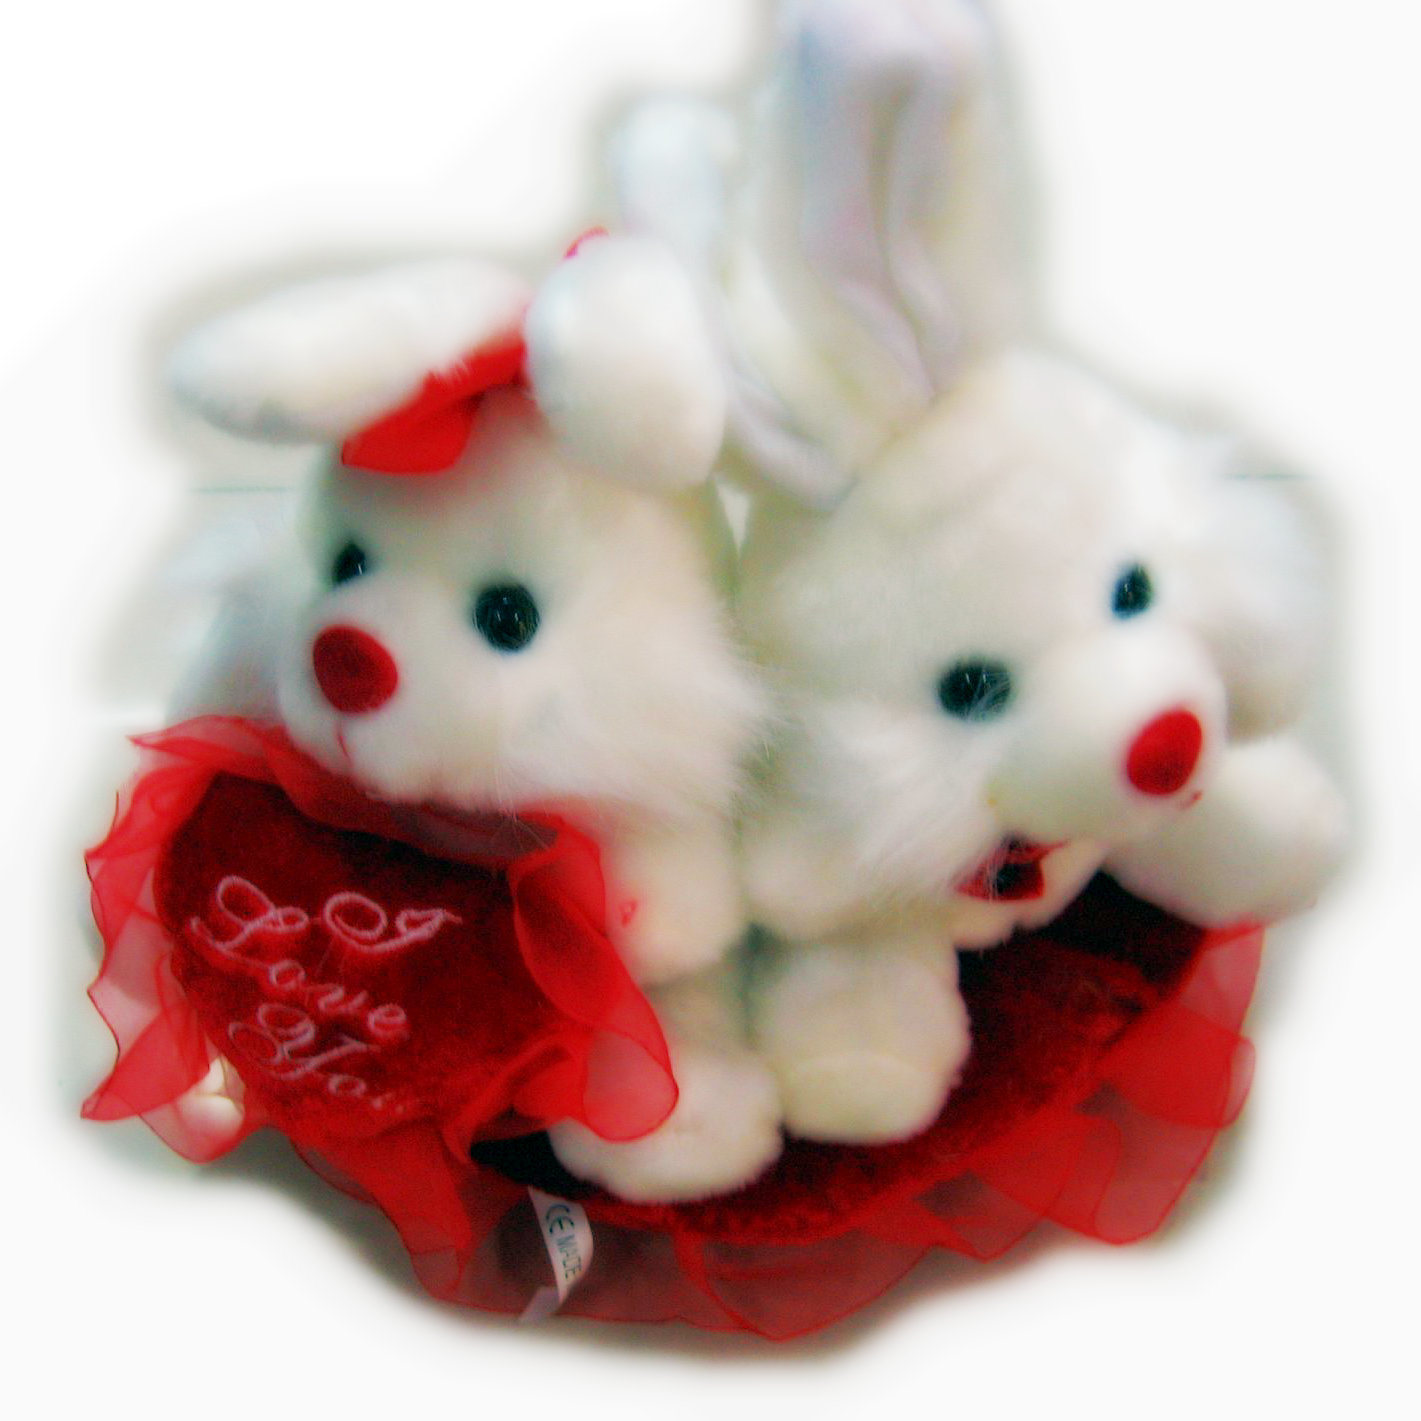 Soft Toys Product : China wedding soft toy yp toys